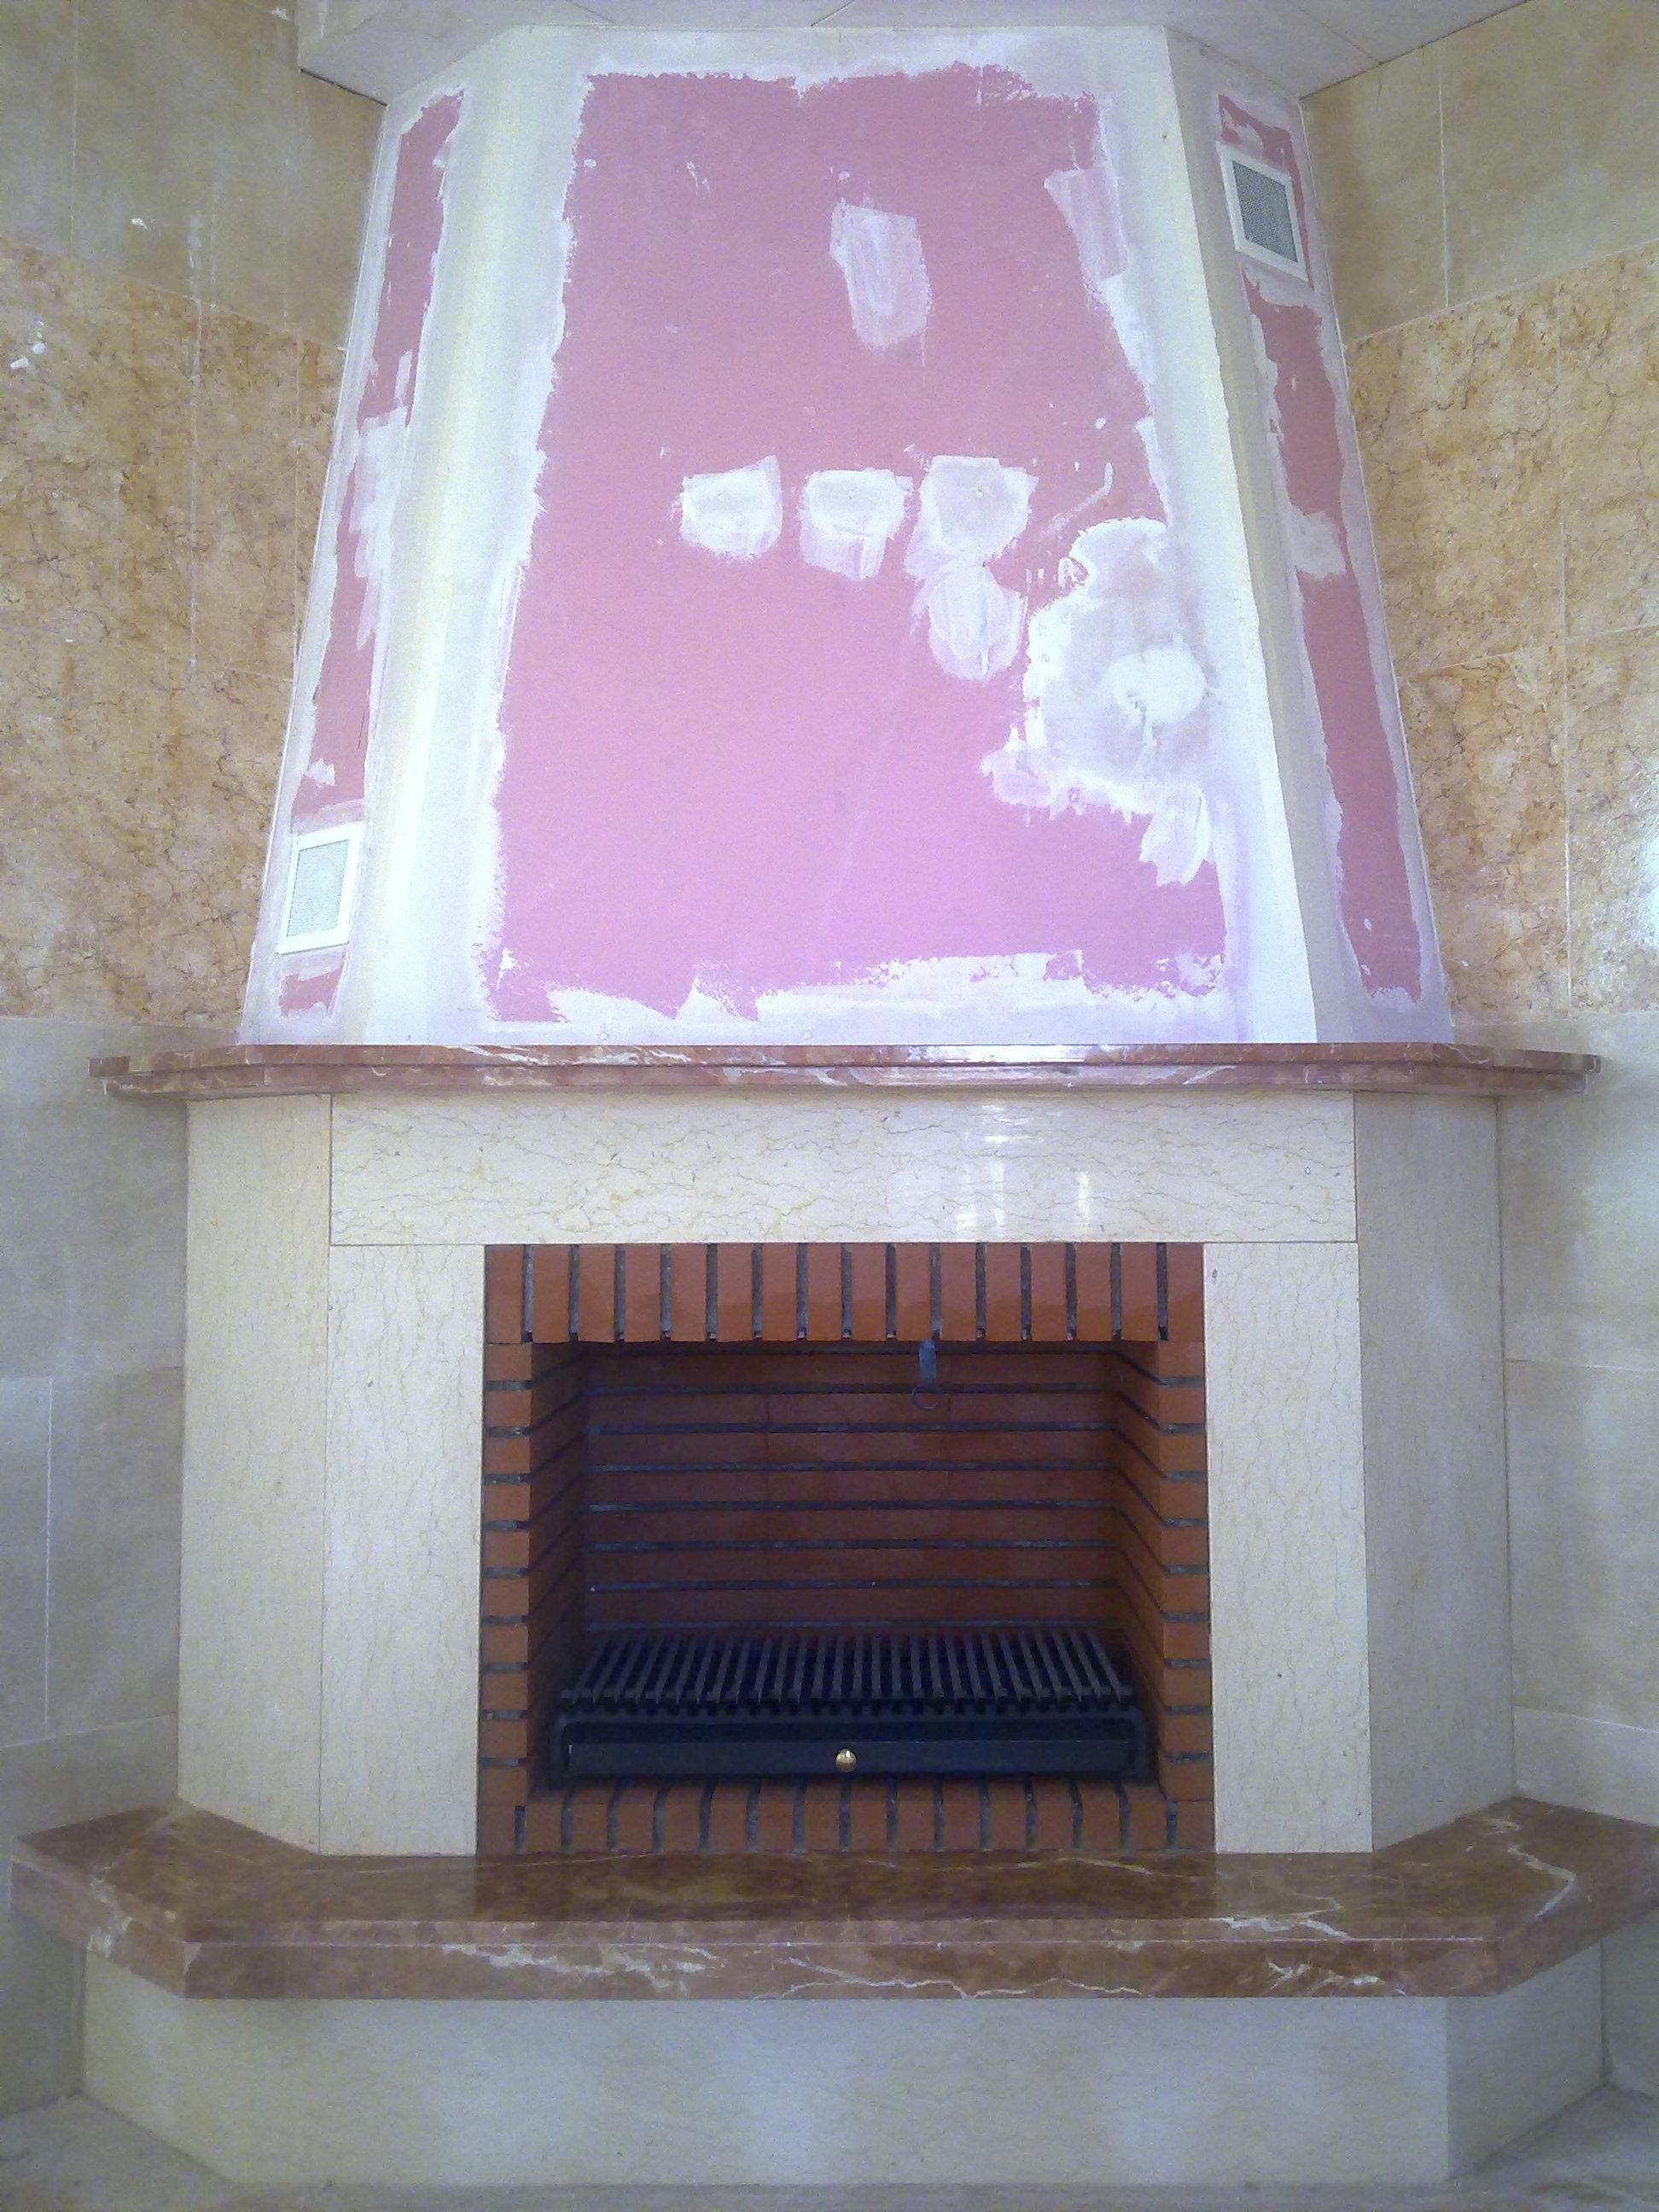 Revestimiento en marmol crema marfil modelo Valira.PVP620€